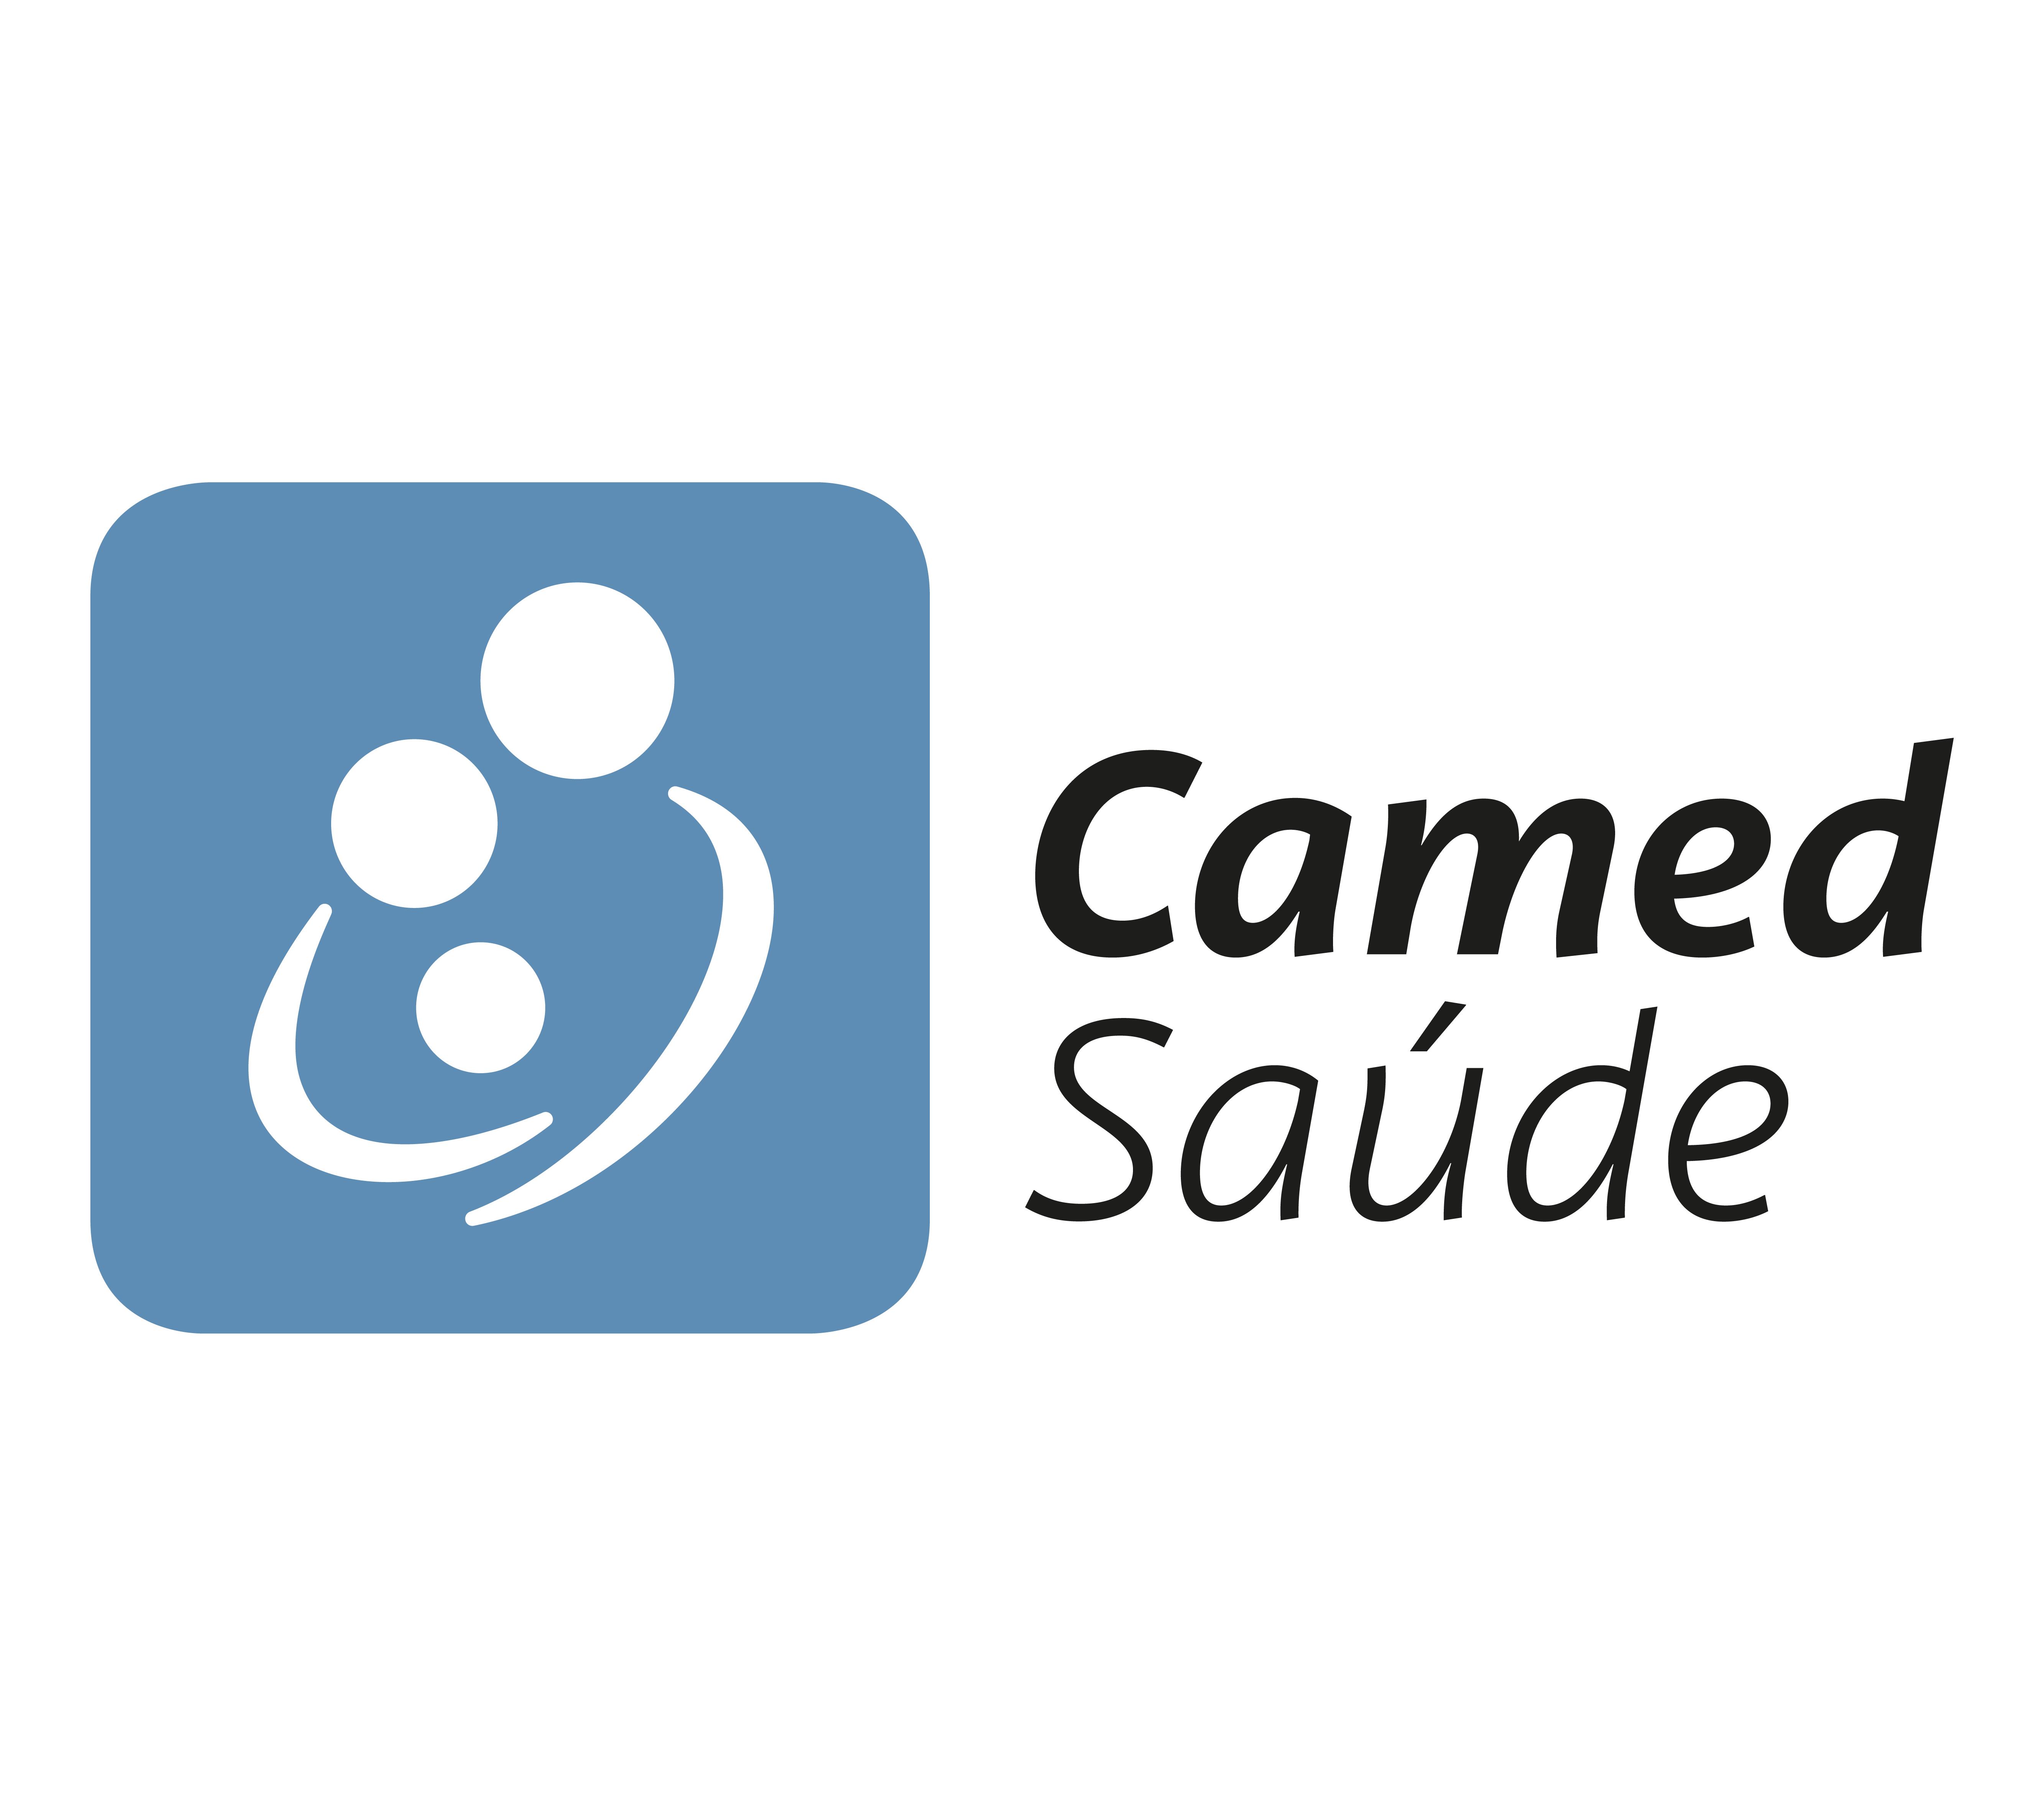 camed_saude.jpg